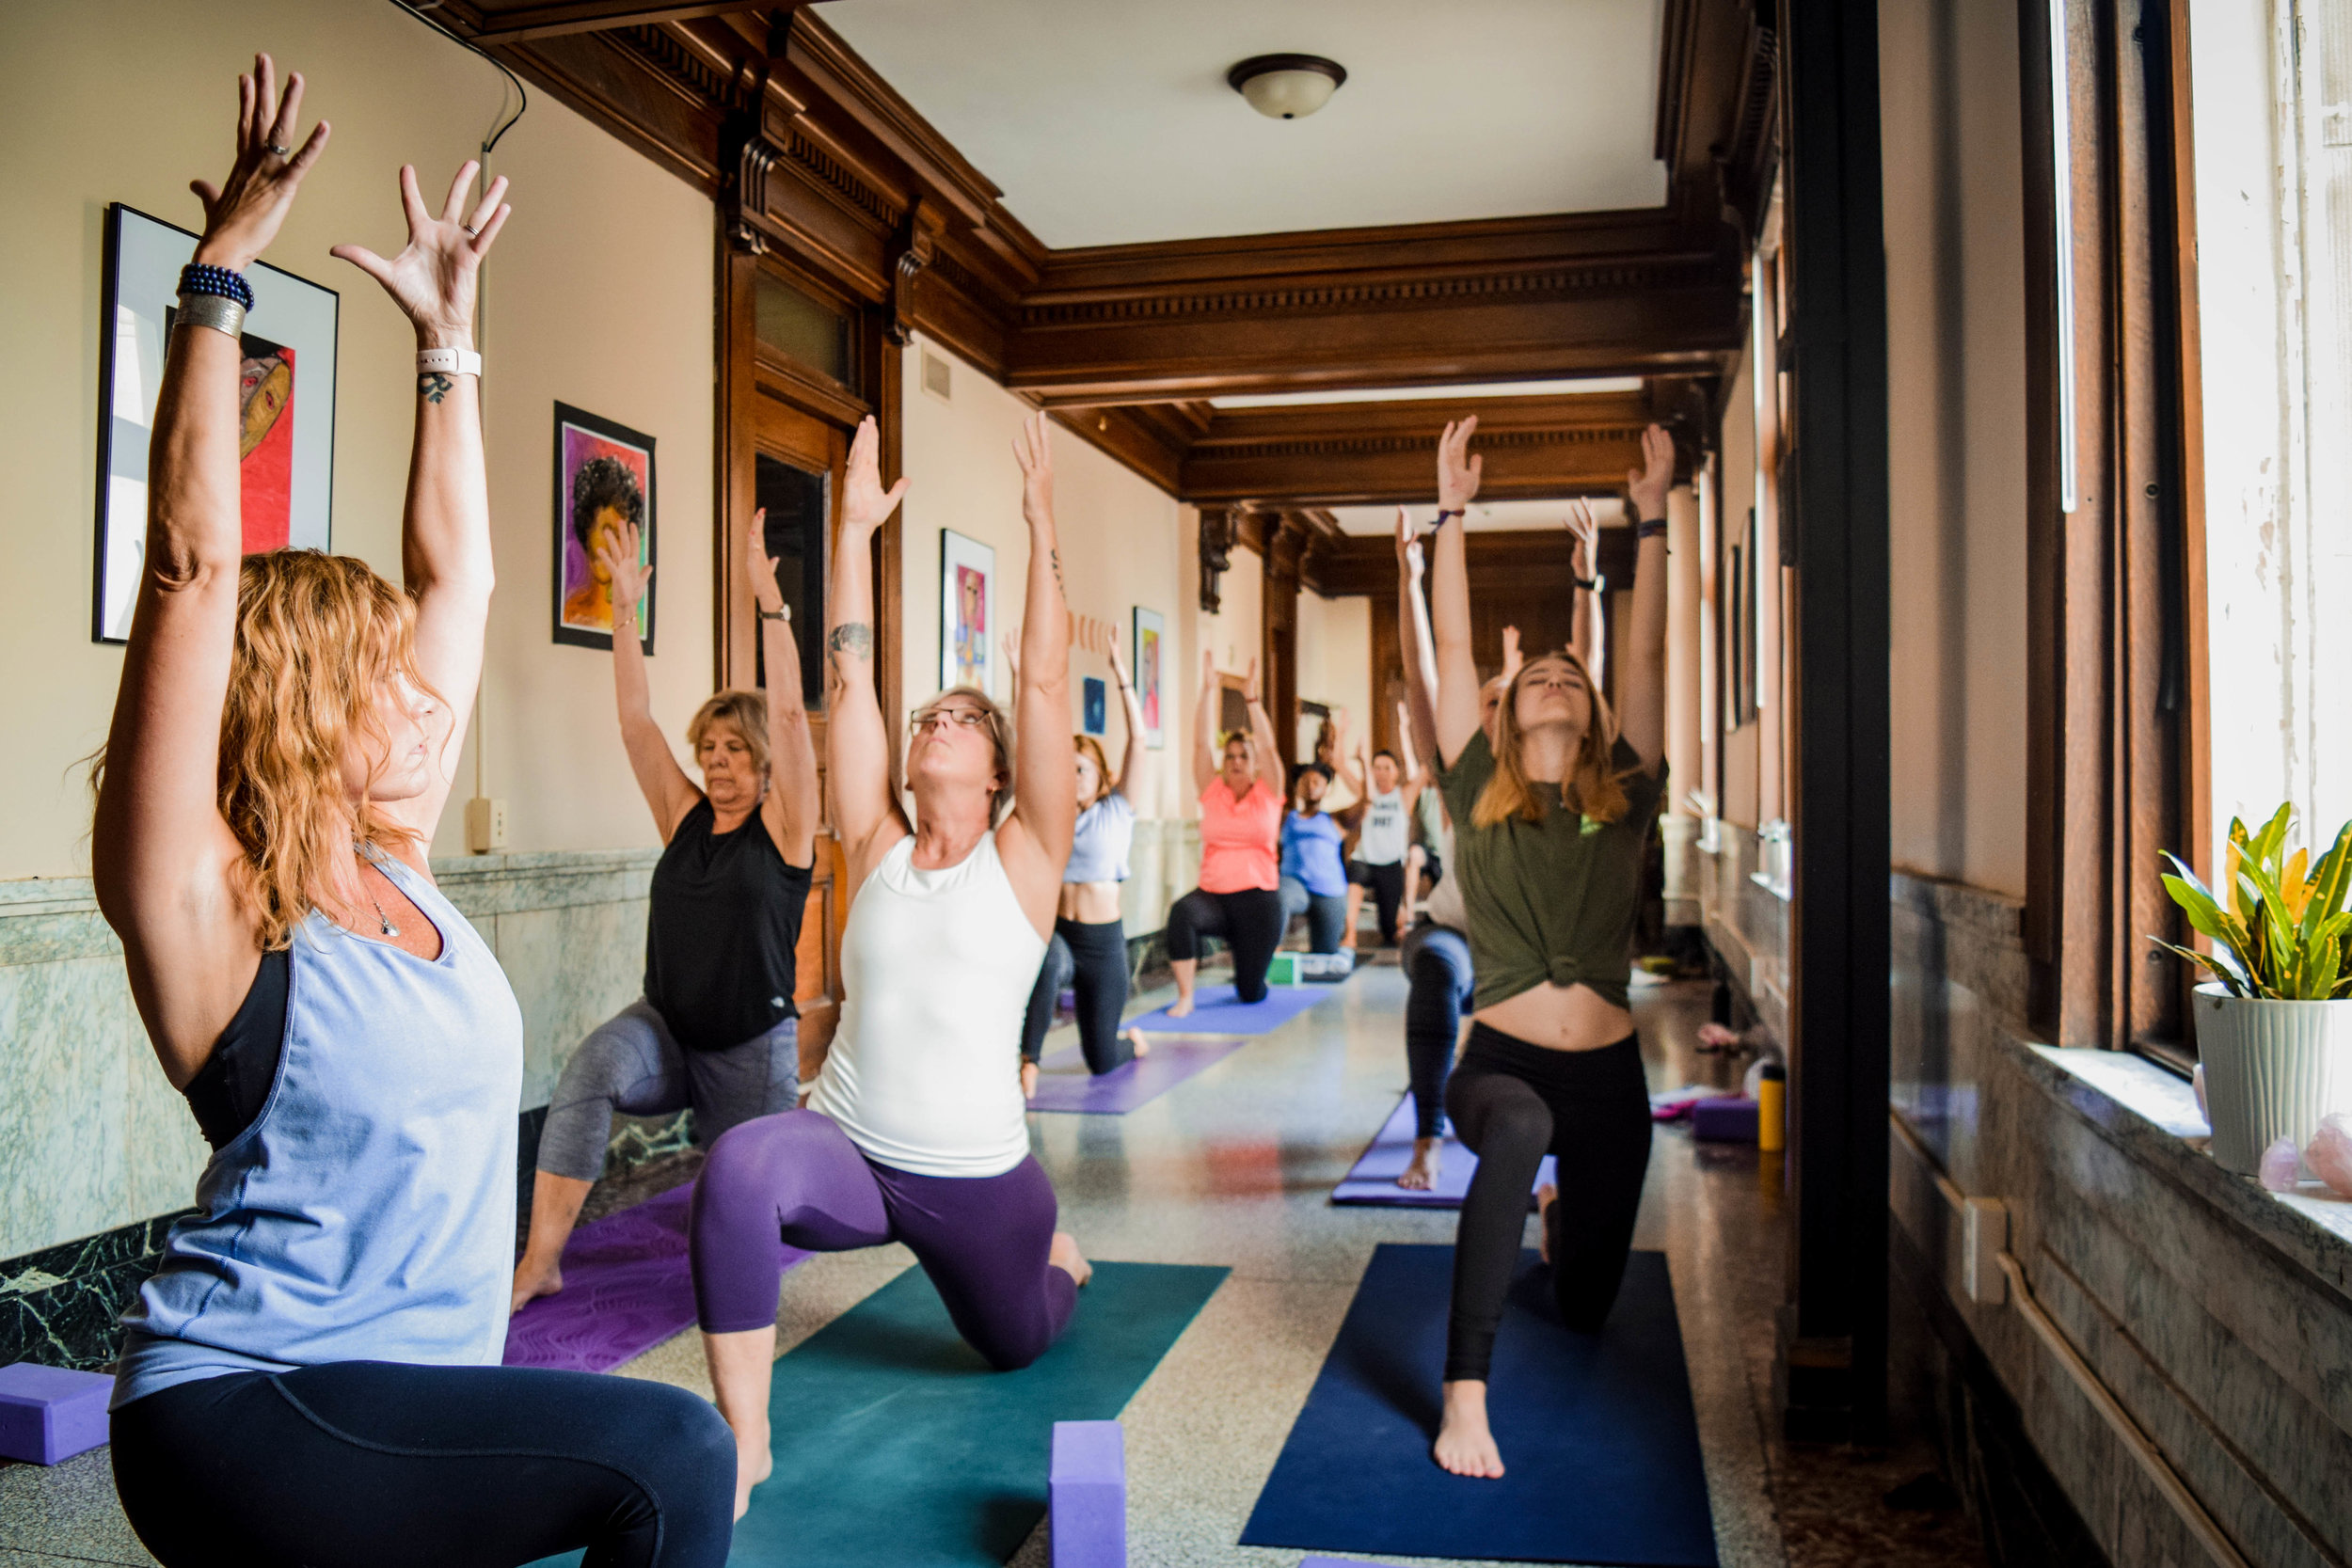 Road to Om Yoga Studio Classes Photo 2